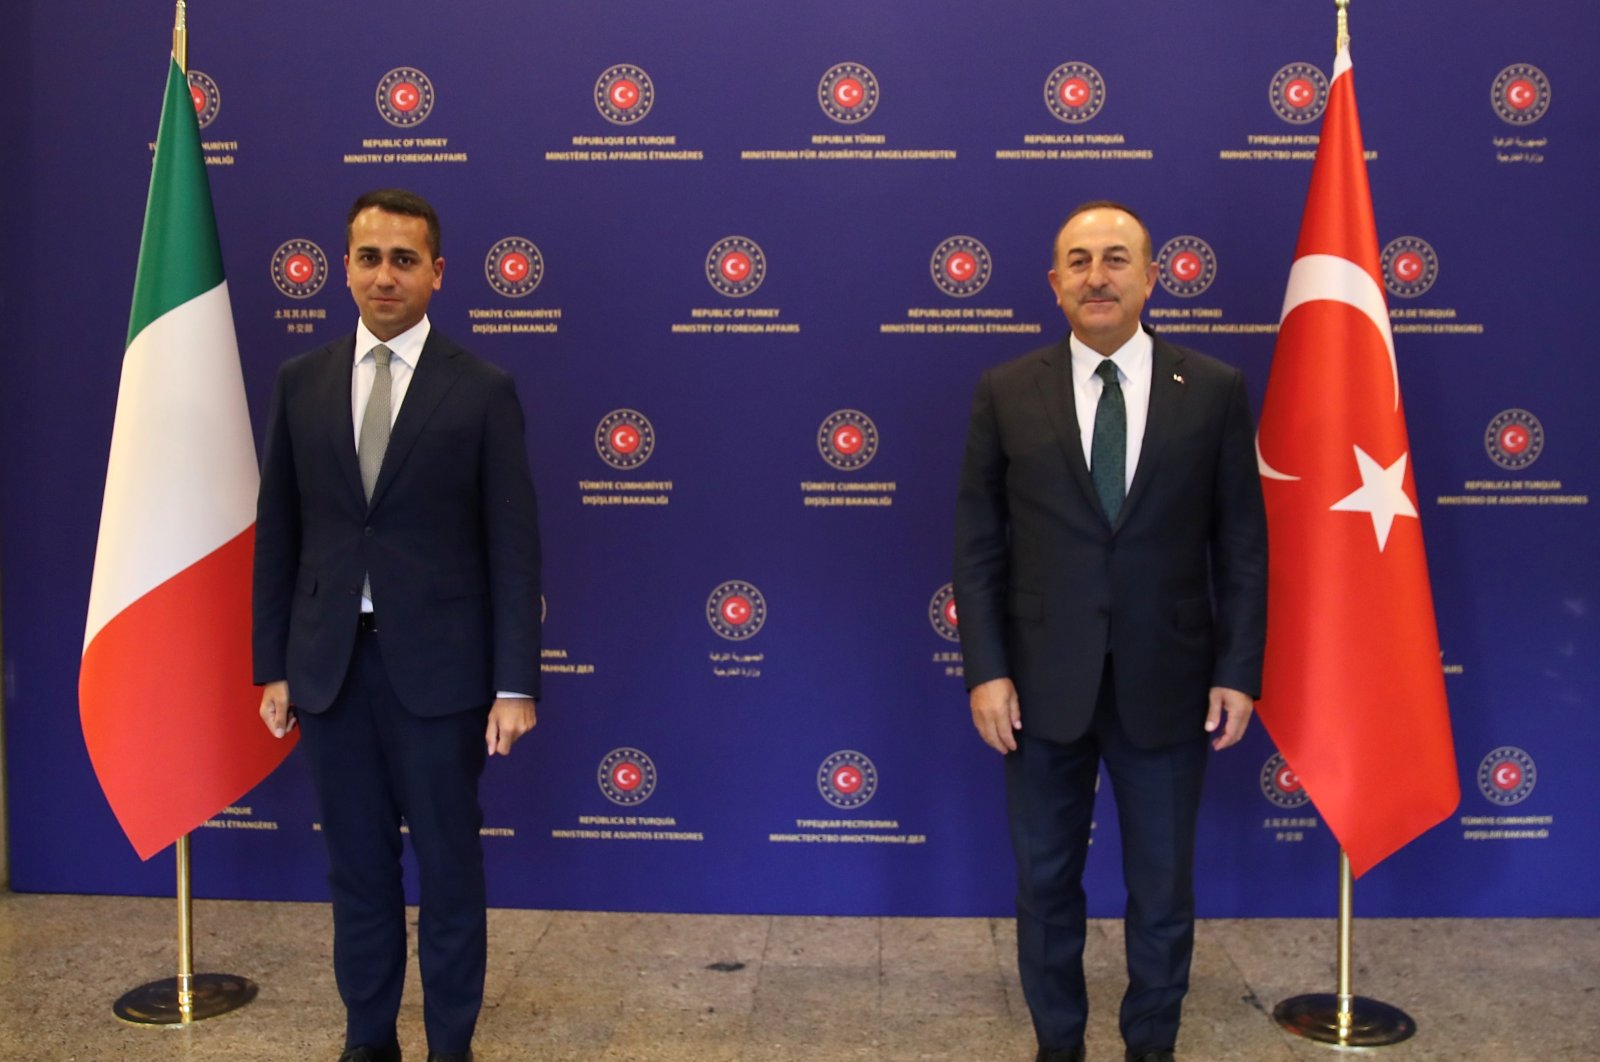 Foreign Minister Mevlüt Çavuşoğlu meets with his Italian counterpart Luigi Di Maio in Ankara, Turkey, June 19, 2020.